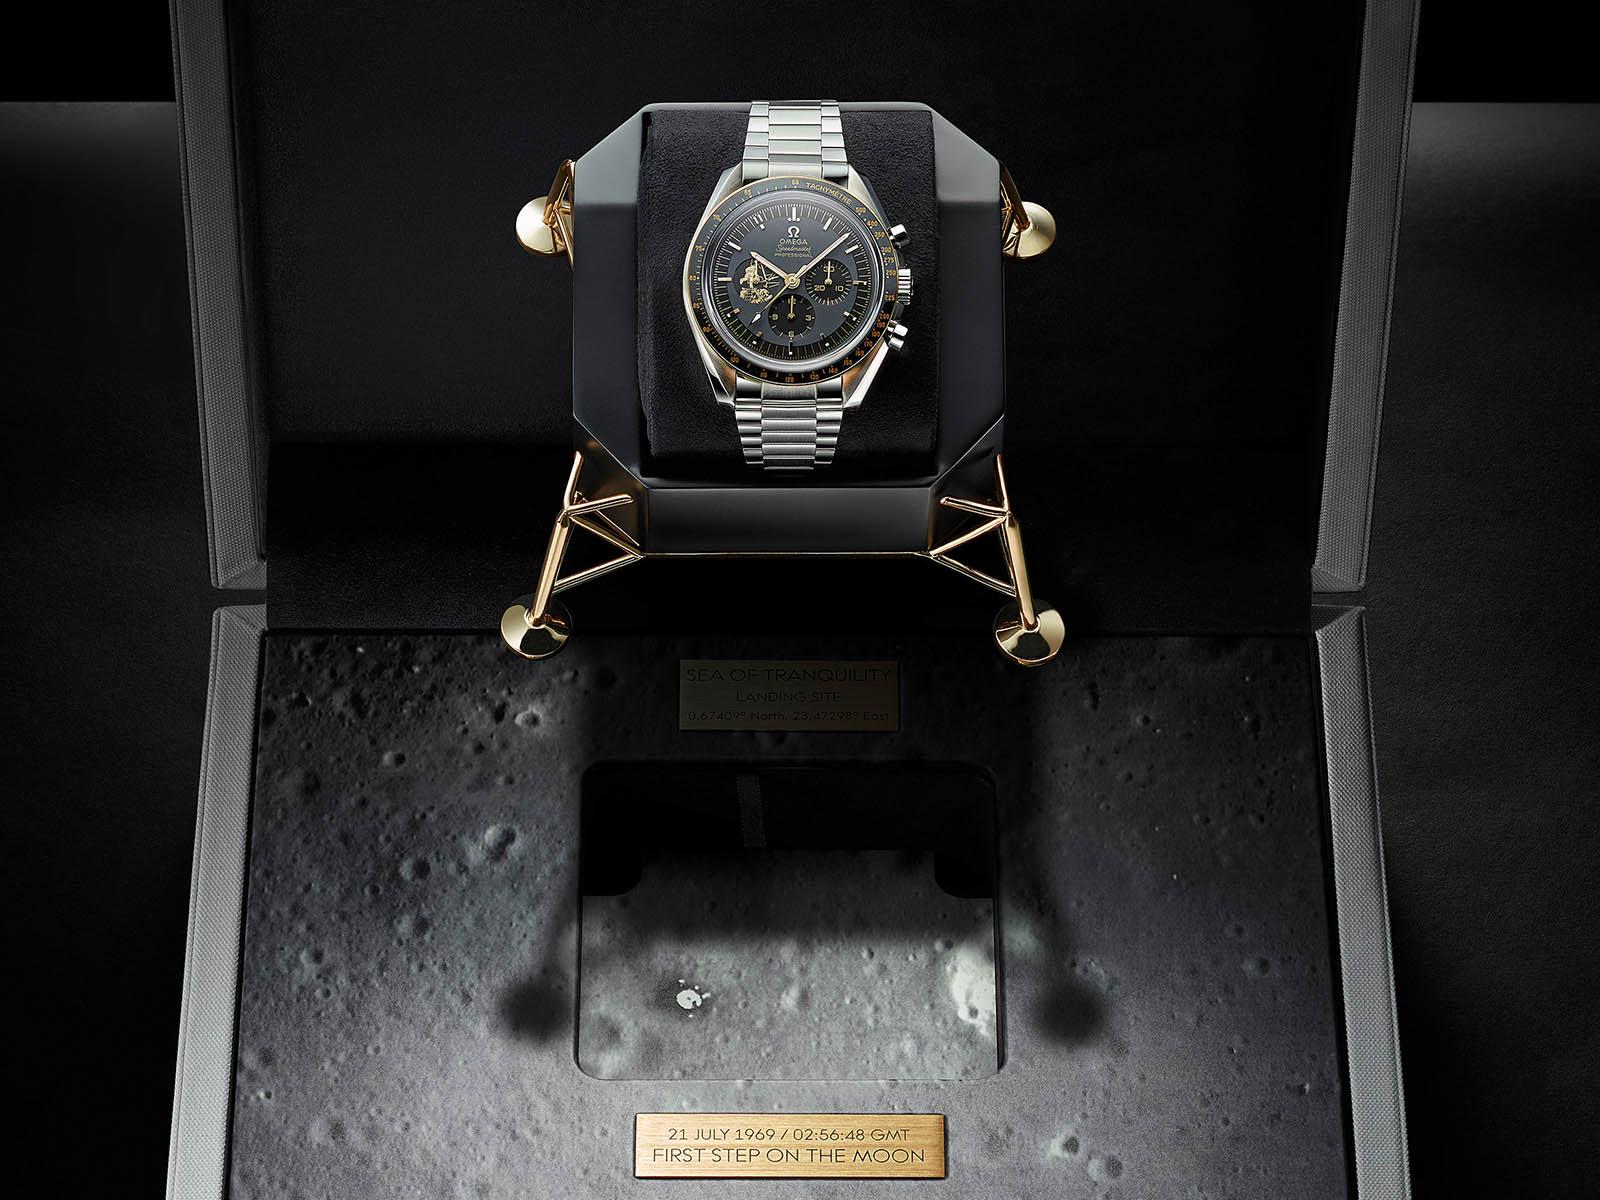 310-20-42-50-01-001-omega-speedmaster-apollo-11-50th-anniversary-limited-edition-9.jpg